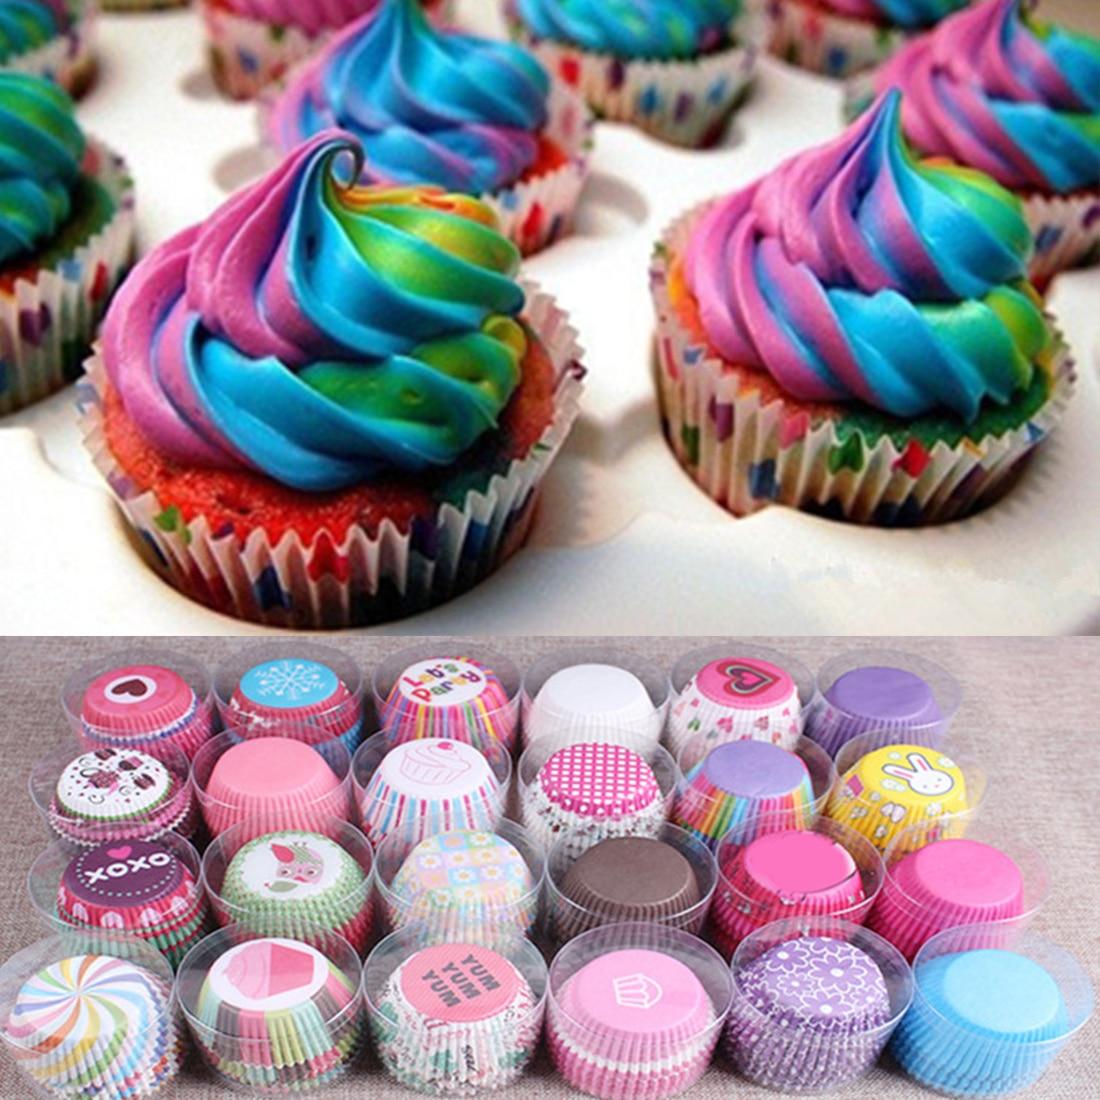 Besar 100 Pcs/lot Alat Memasak Manila Kertas Cangkir Kue Liners Panggang Muffin Dapur Cupcake Kasus Kue Mould -Internasional